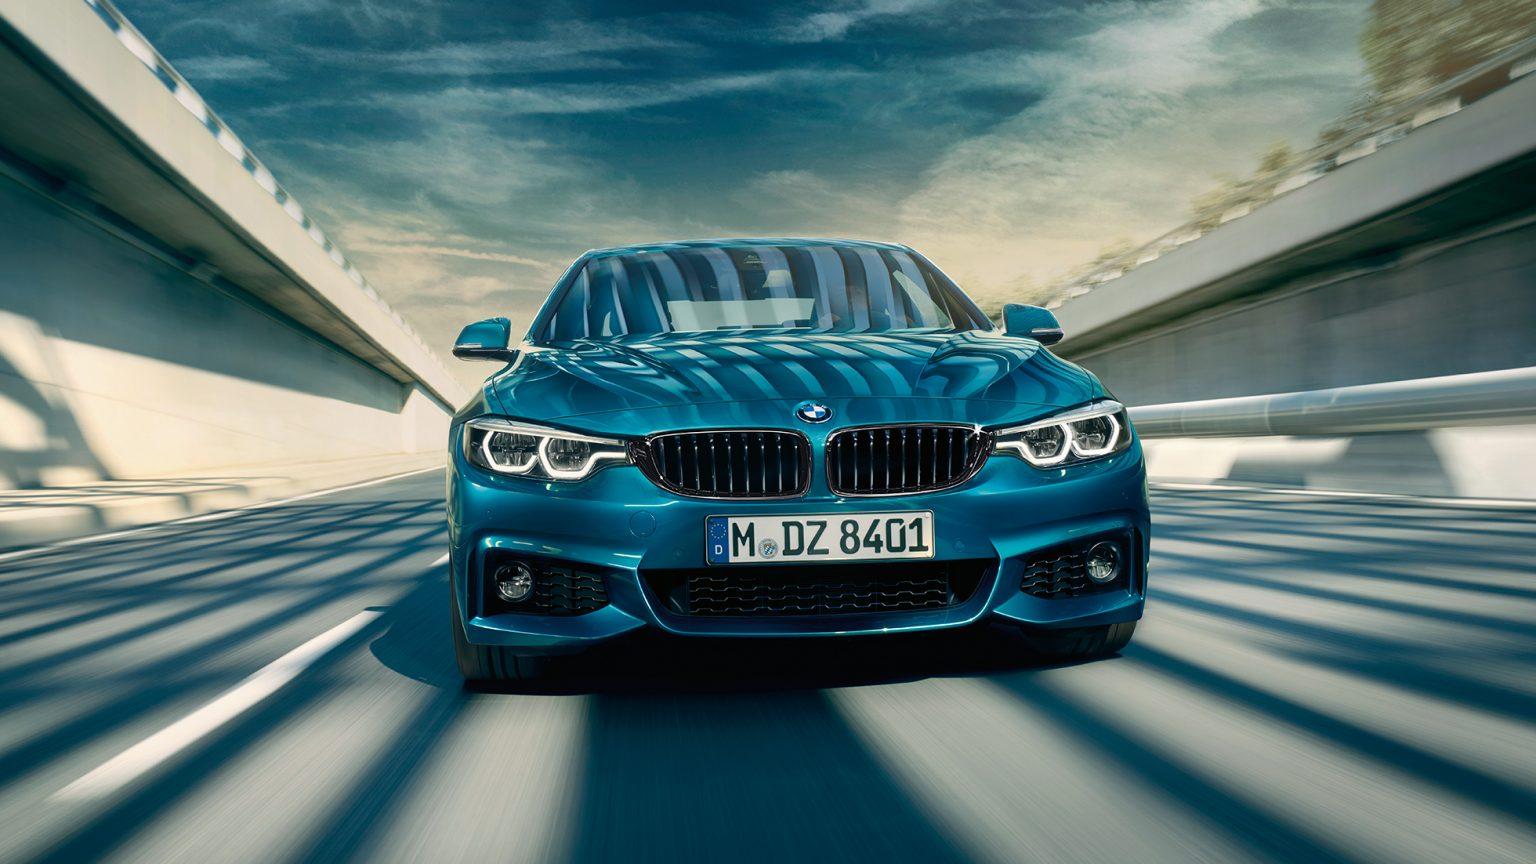 bmw-4-series-coupe-inspire-mg-exterior-interior-design-desktop-01